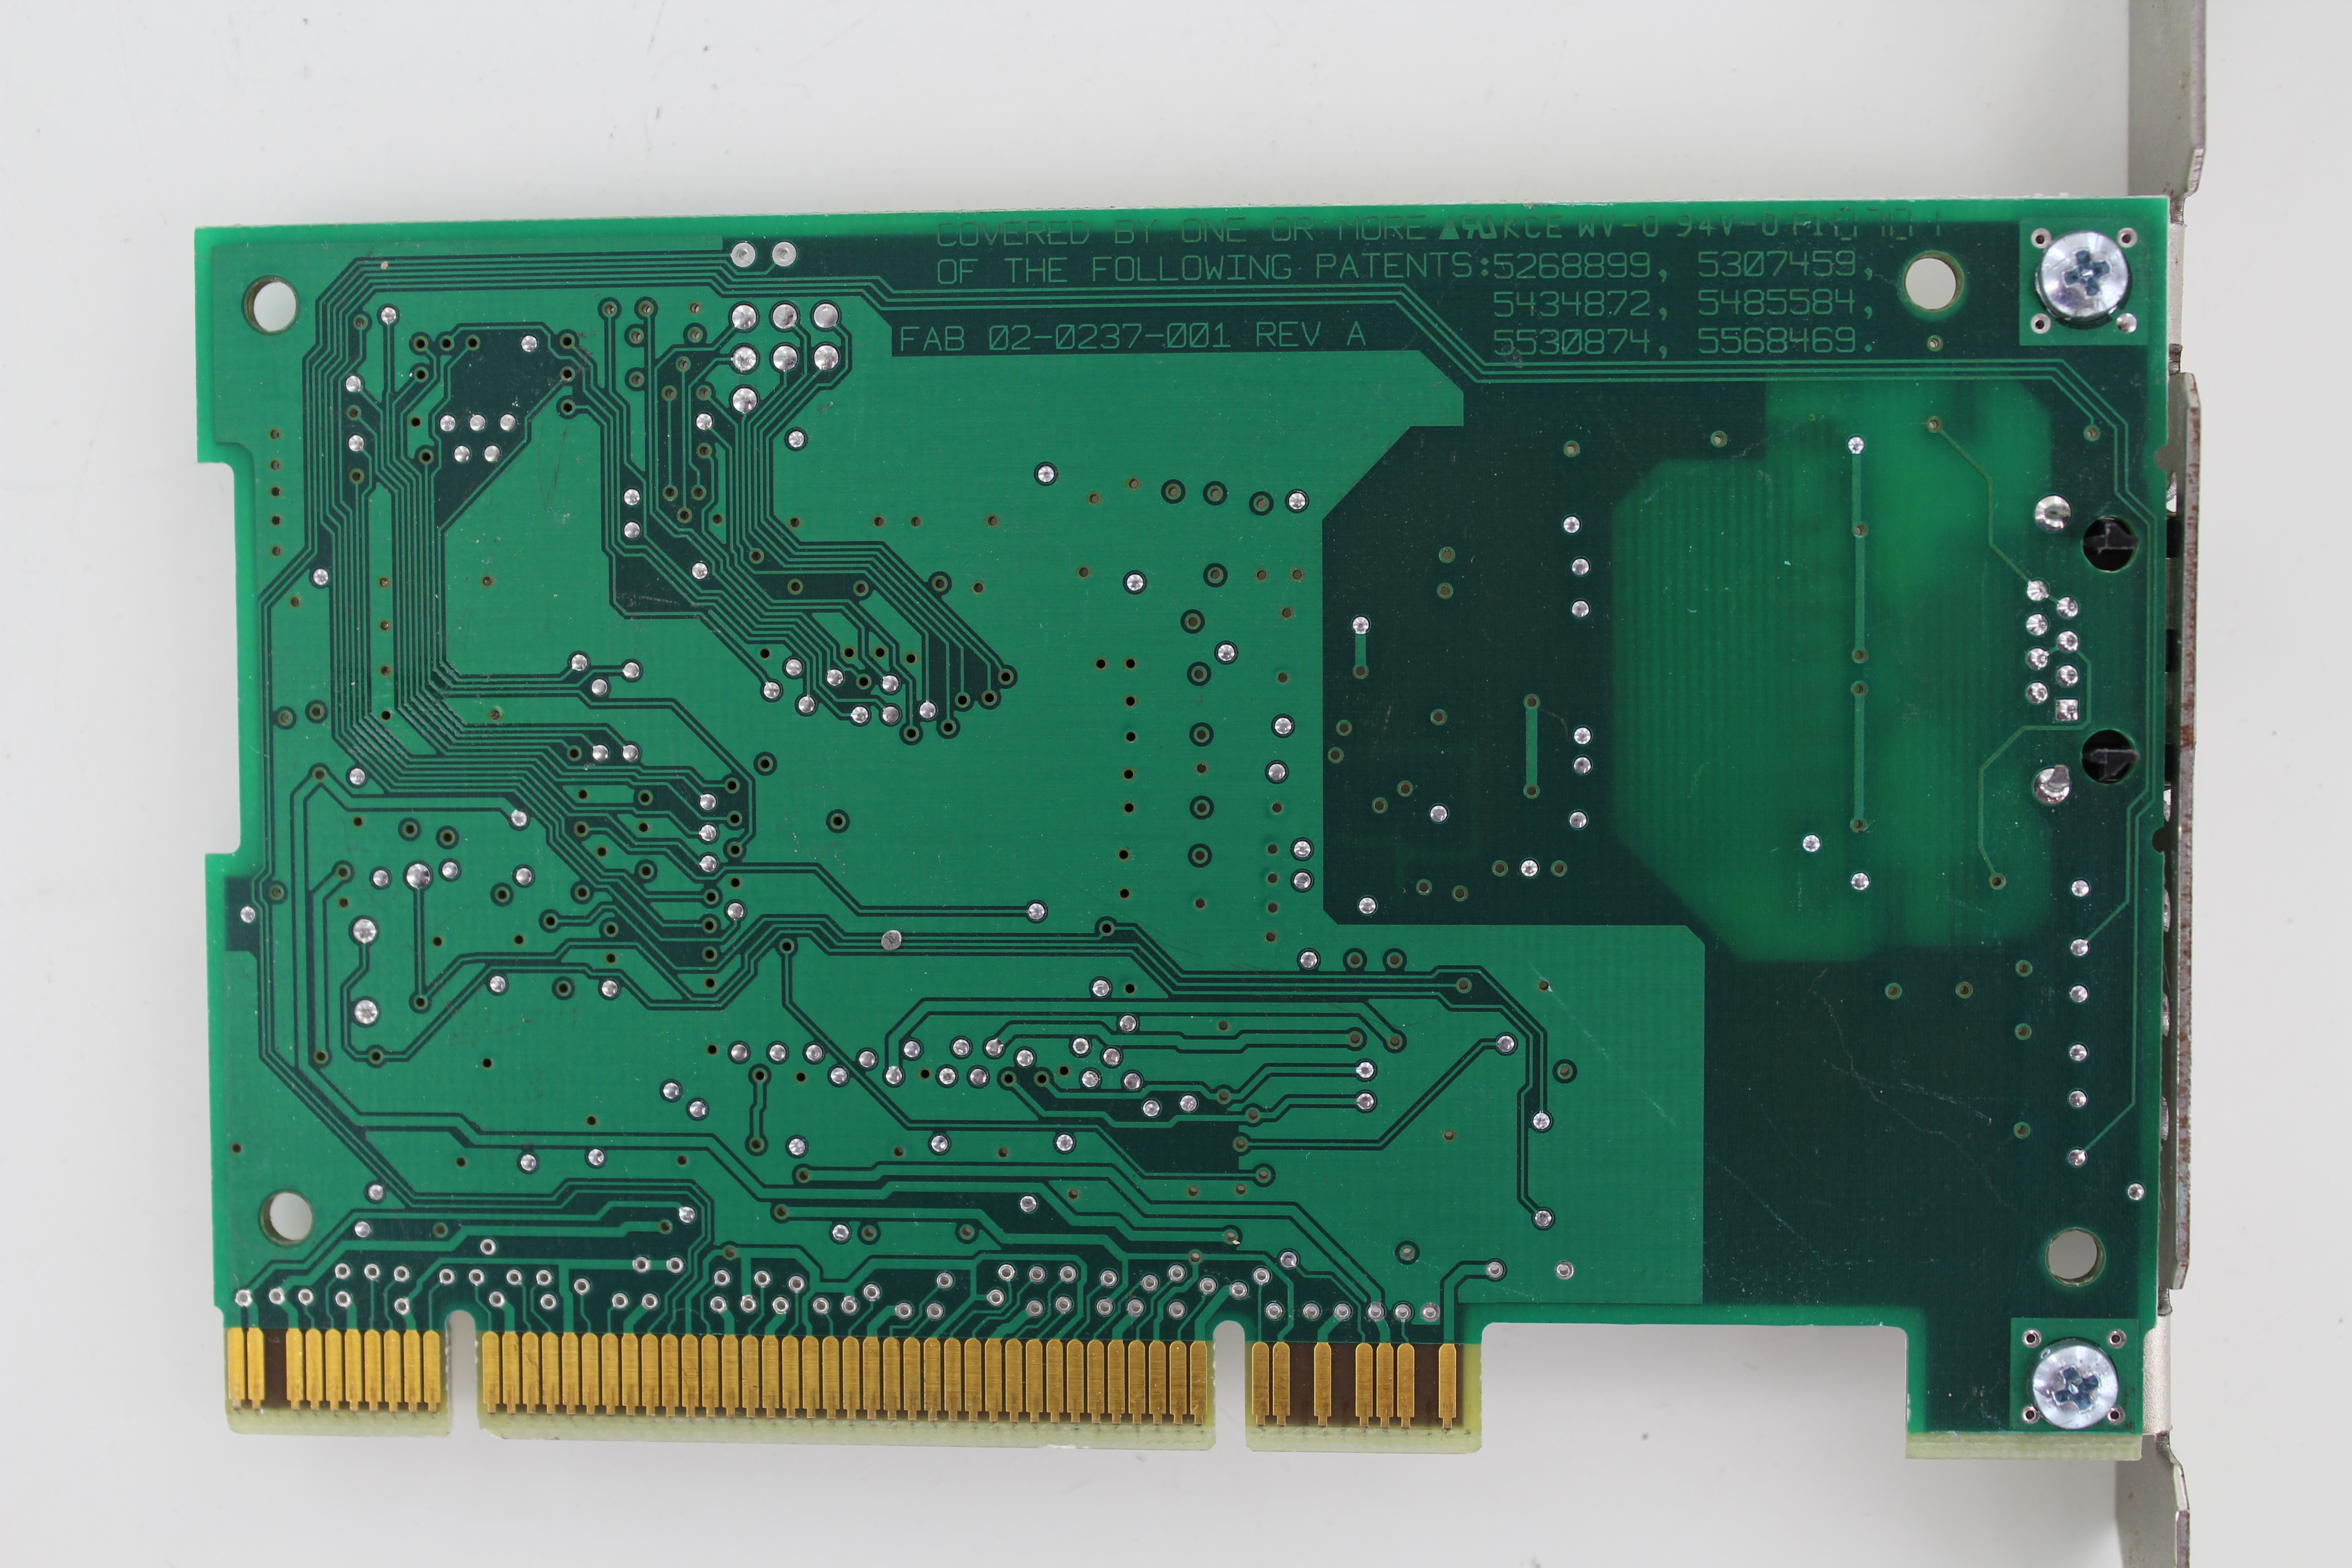 3com 3c905c-tx m driver windows 7 64 bit